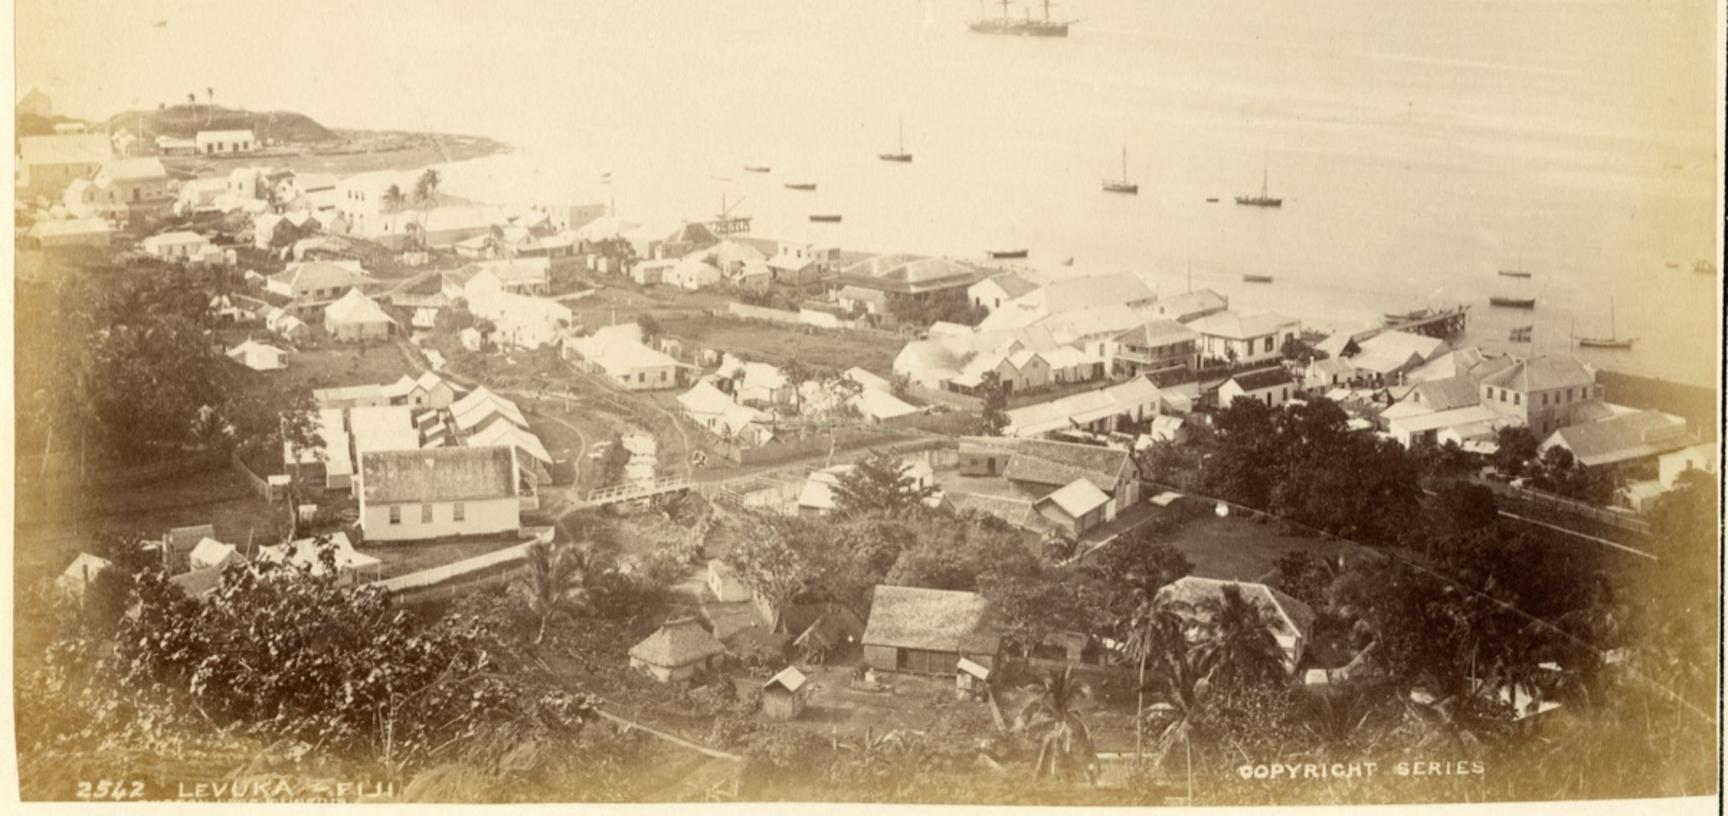 View of the former capital of Levuka on the Fijian island of Ovalau, 'taken from the hills above the Hospital'. Photograph by Alfred Burton for the Burton Brothers studio (Dunedin). Levuka, Ovalau, Fiji. 14 July 1884.